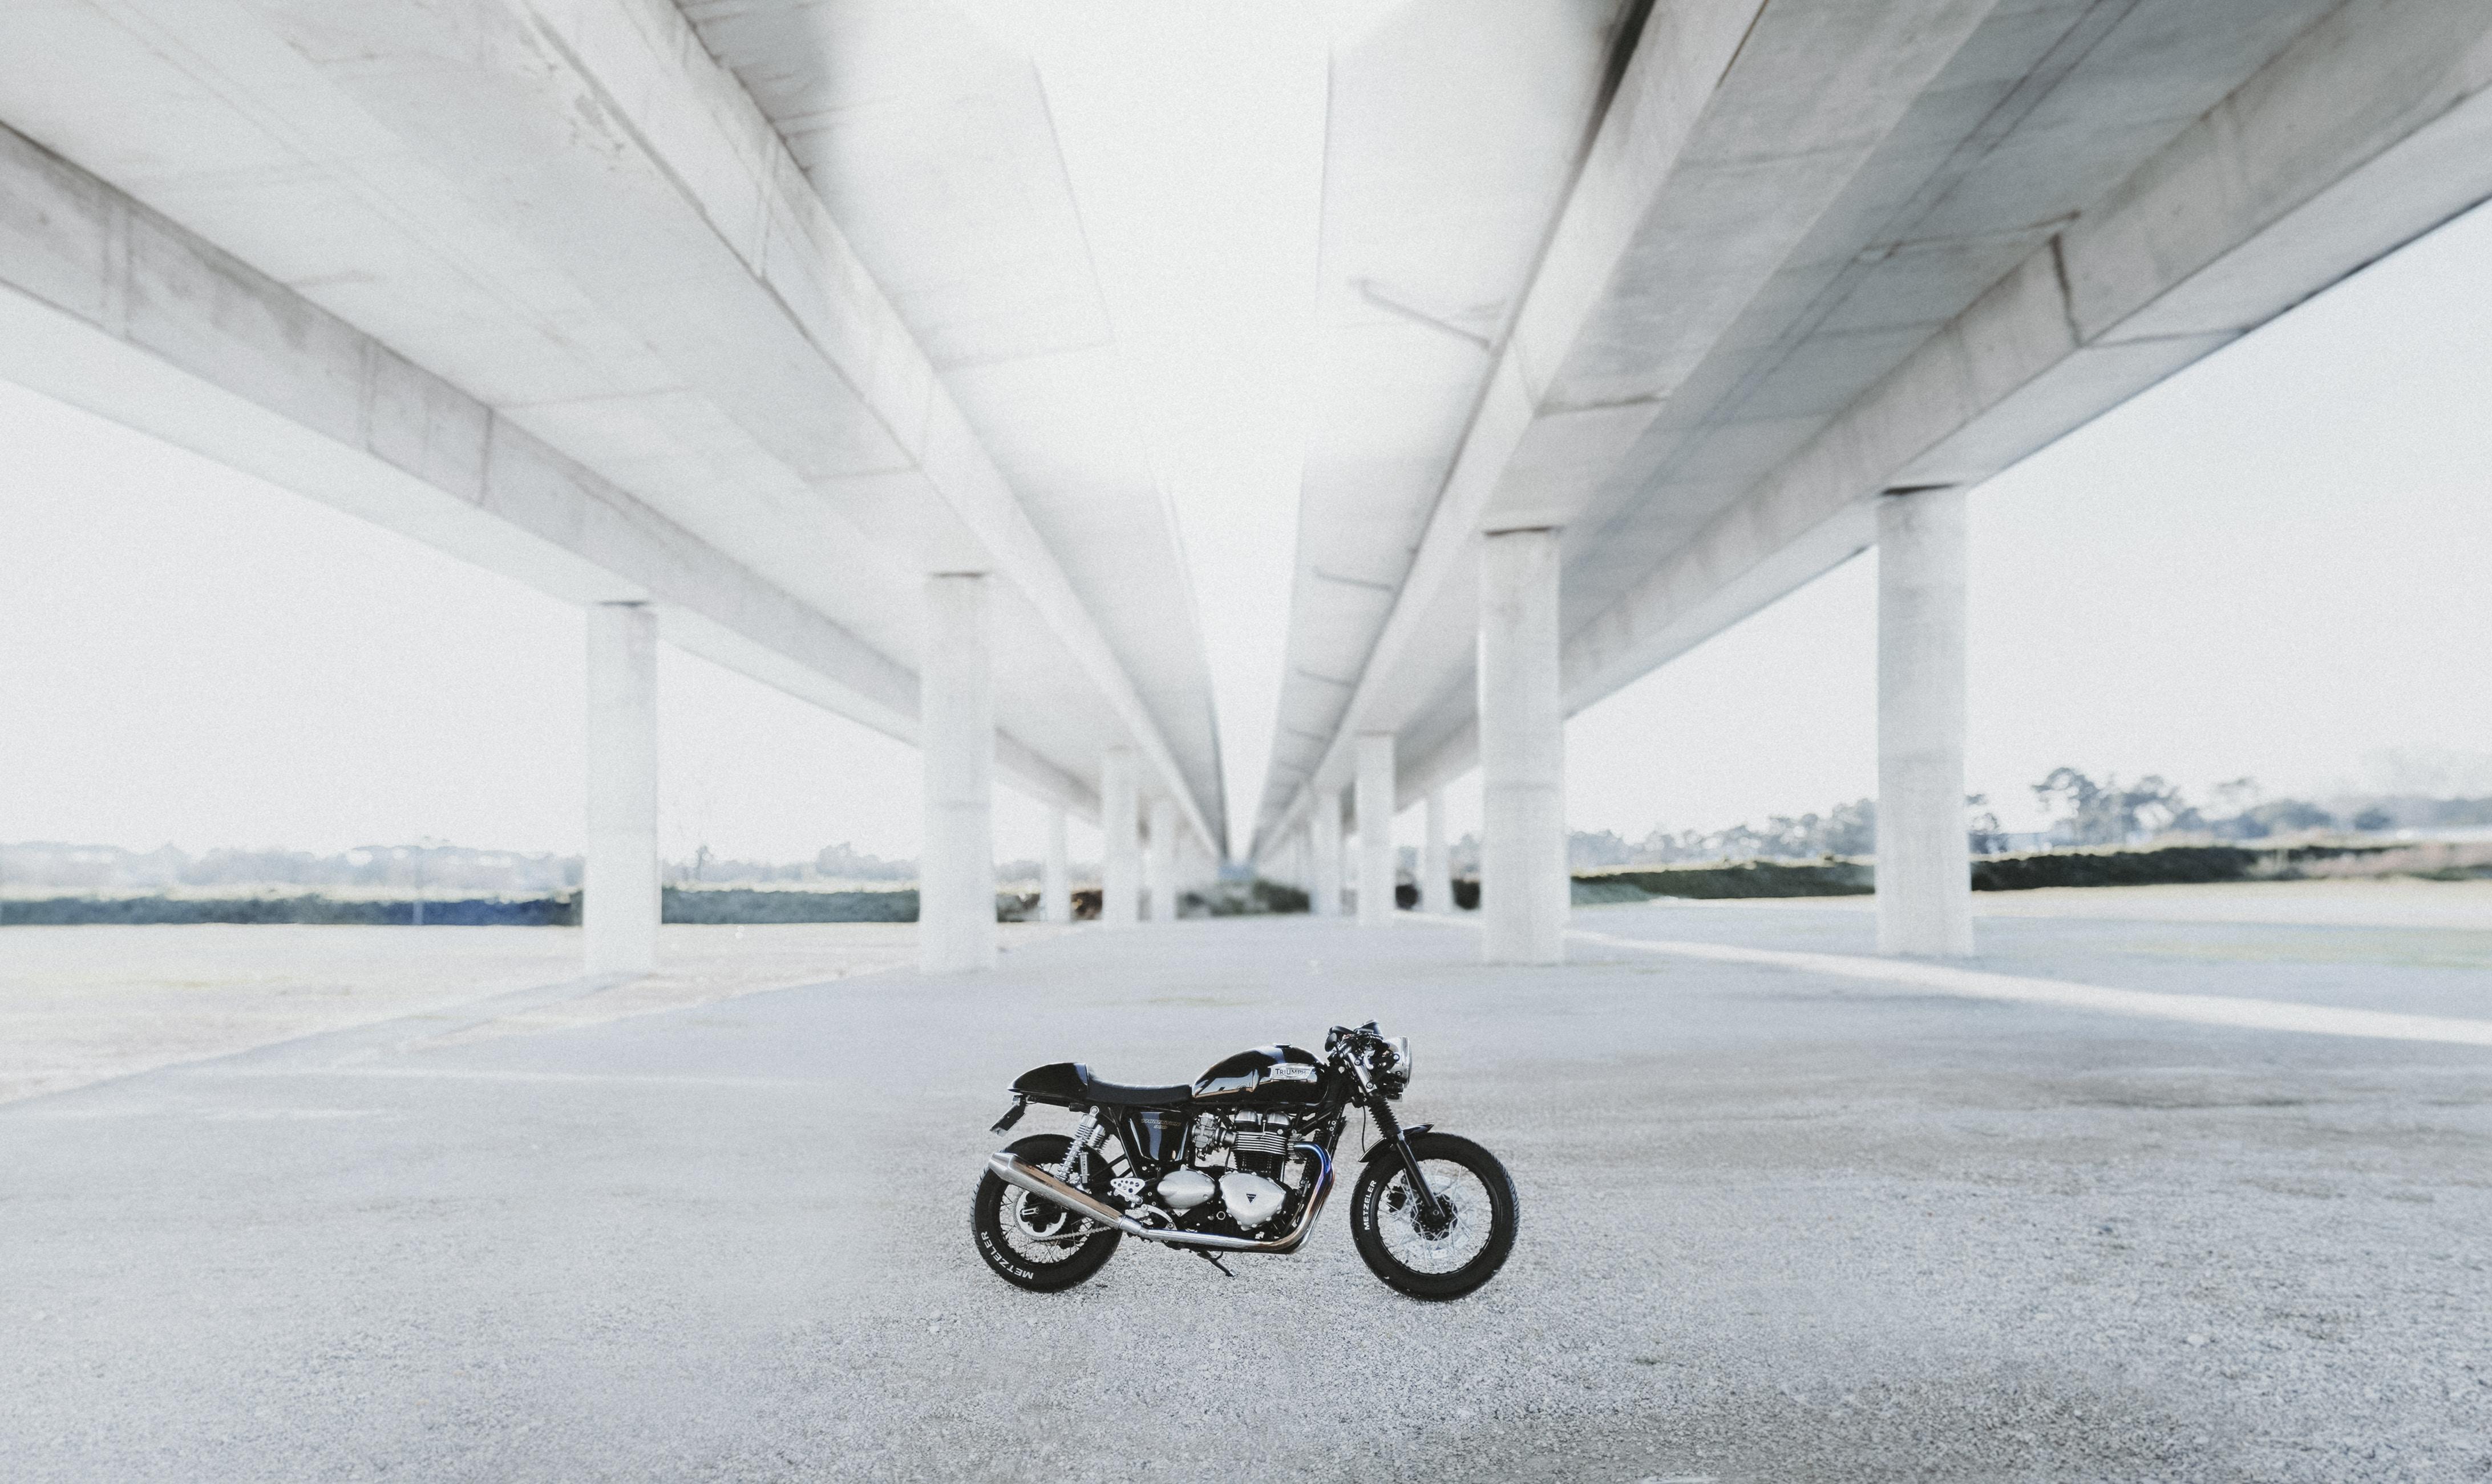 black naked motorcycle under white bridge during daytime